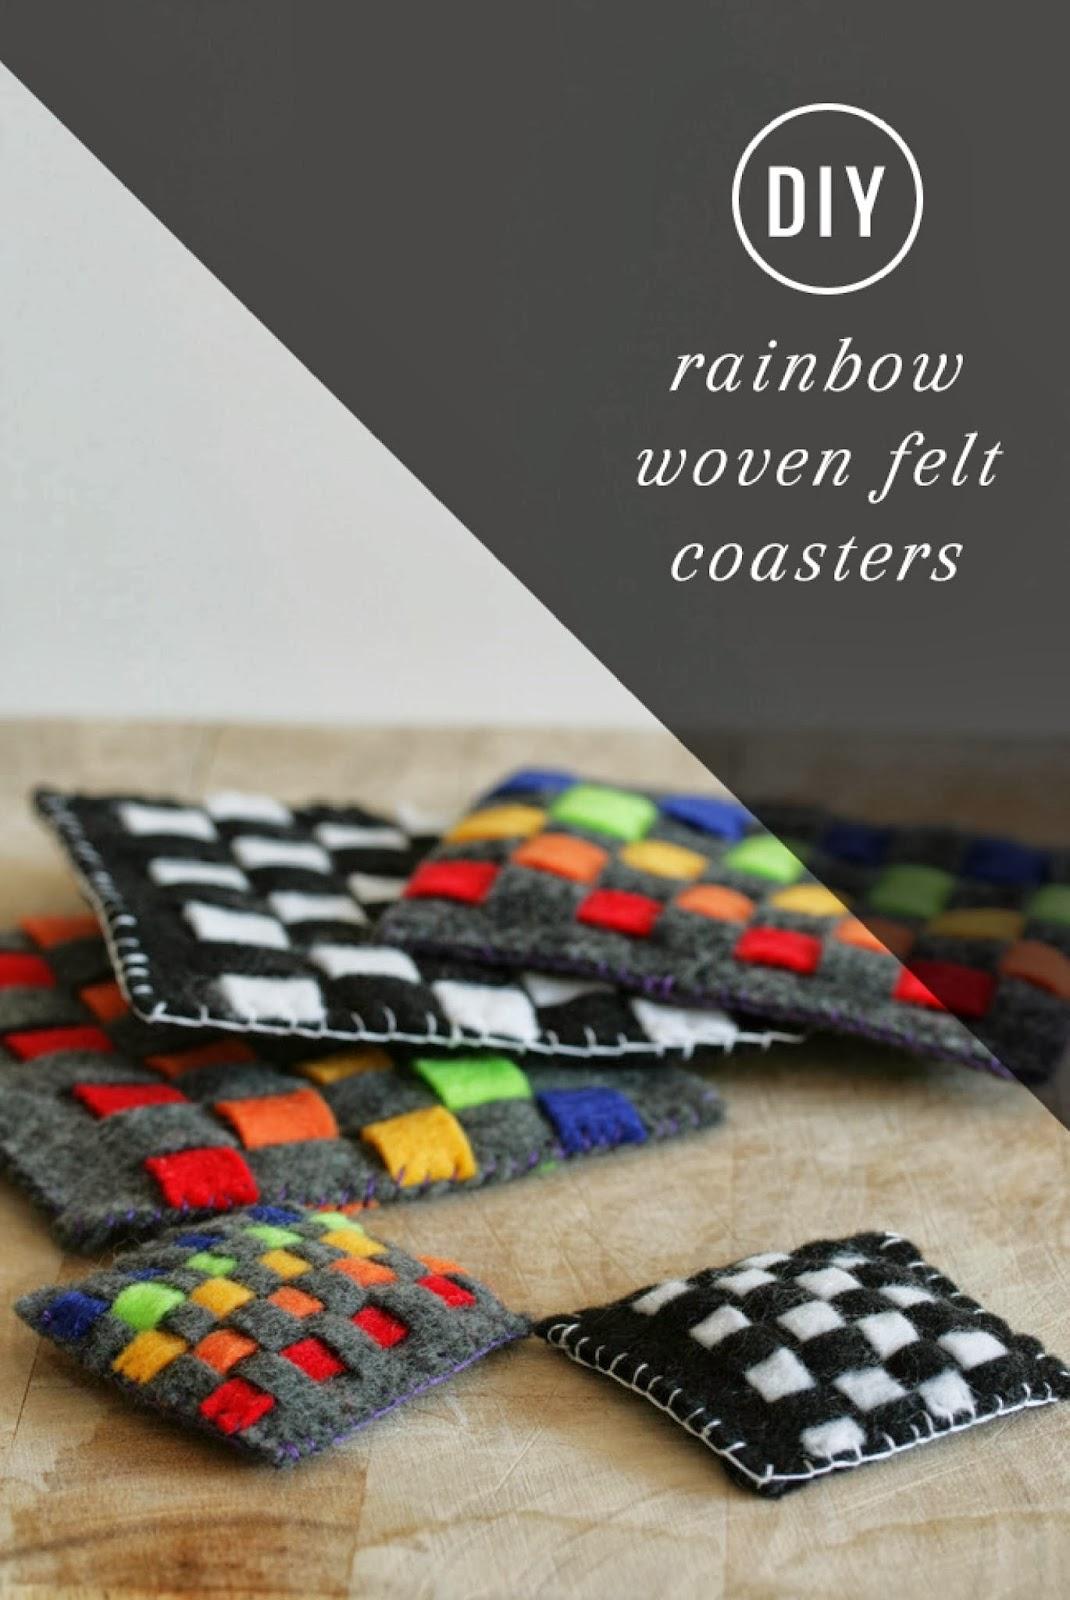 diy rainbow woven felt coasters   handy diy